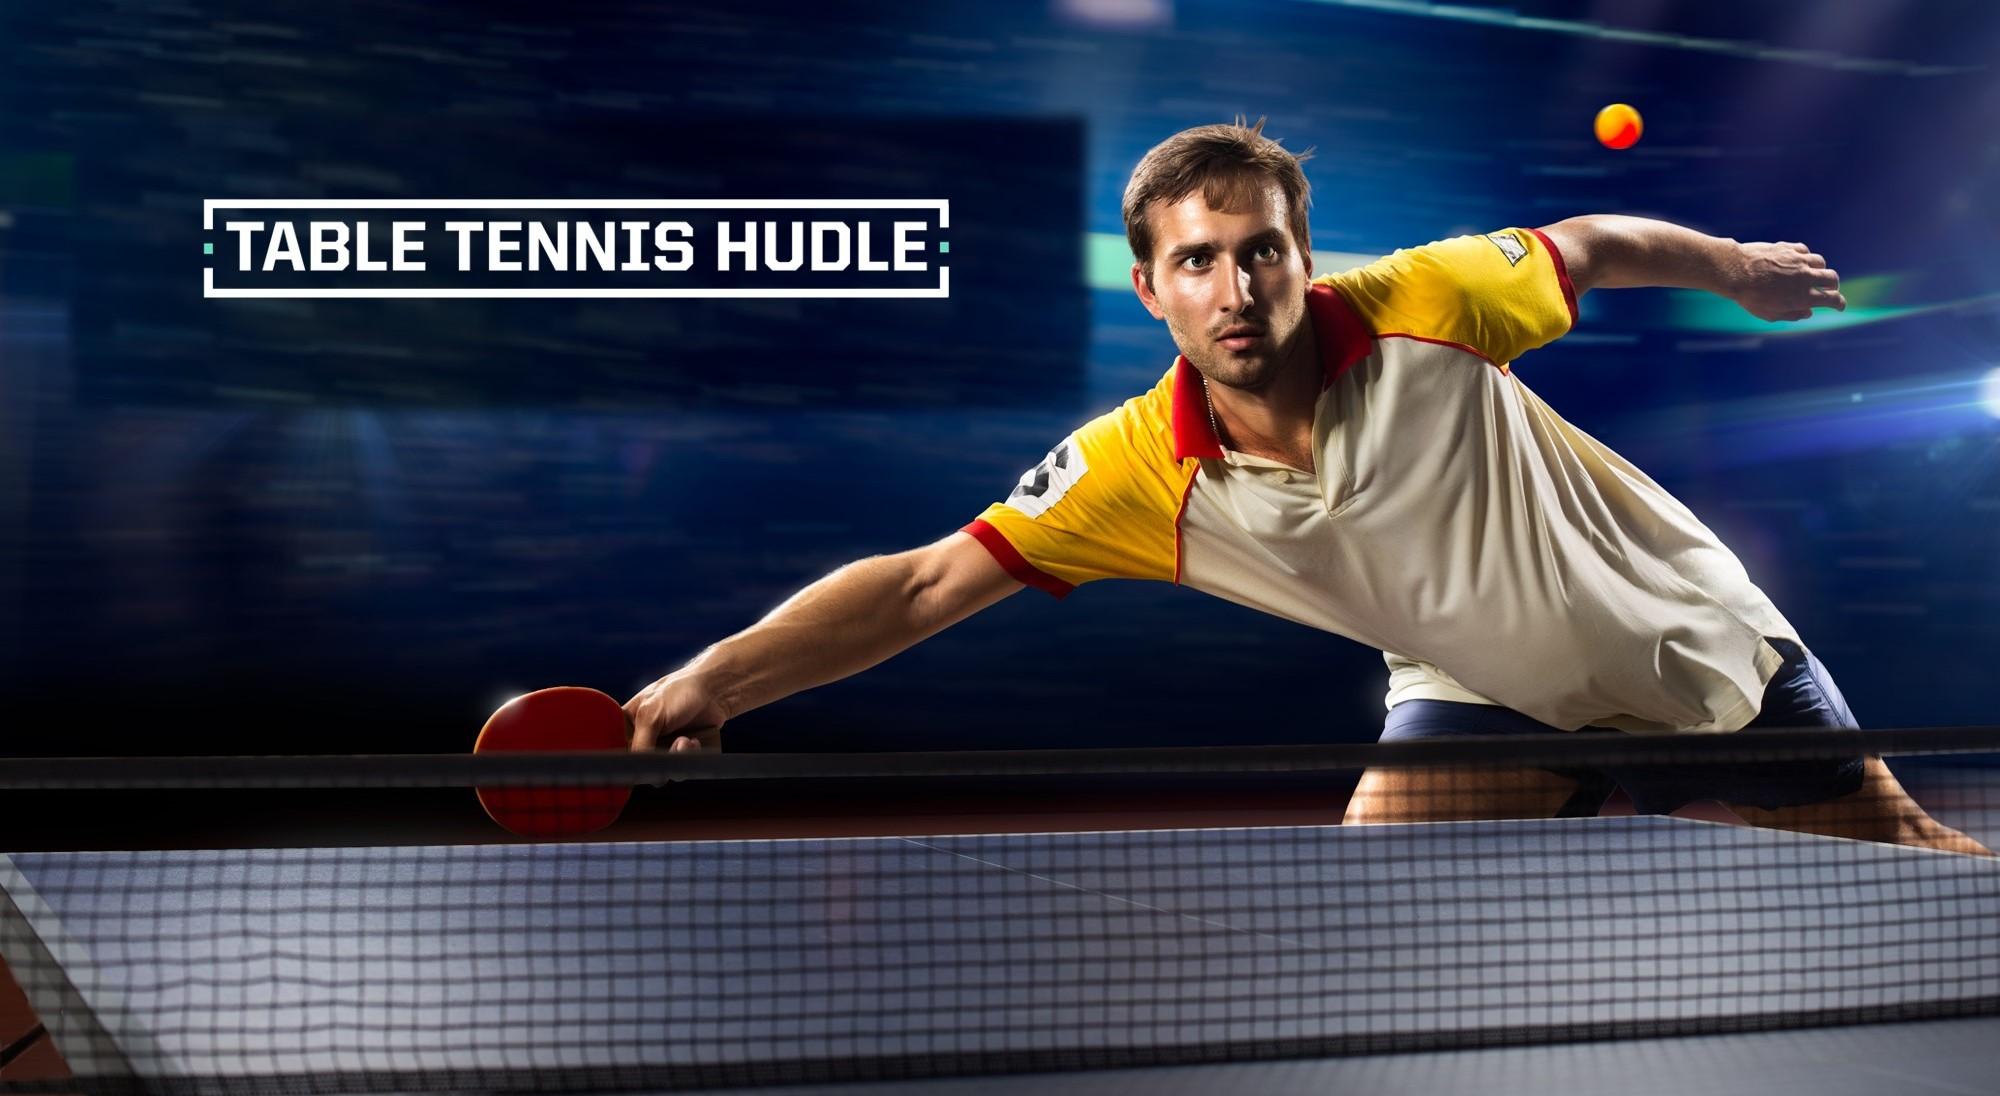 Table Tennis Hudle in Gurugram on May 6, 2018